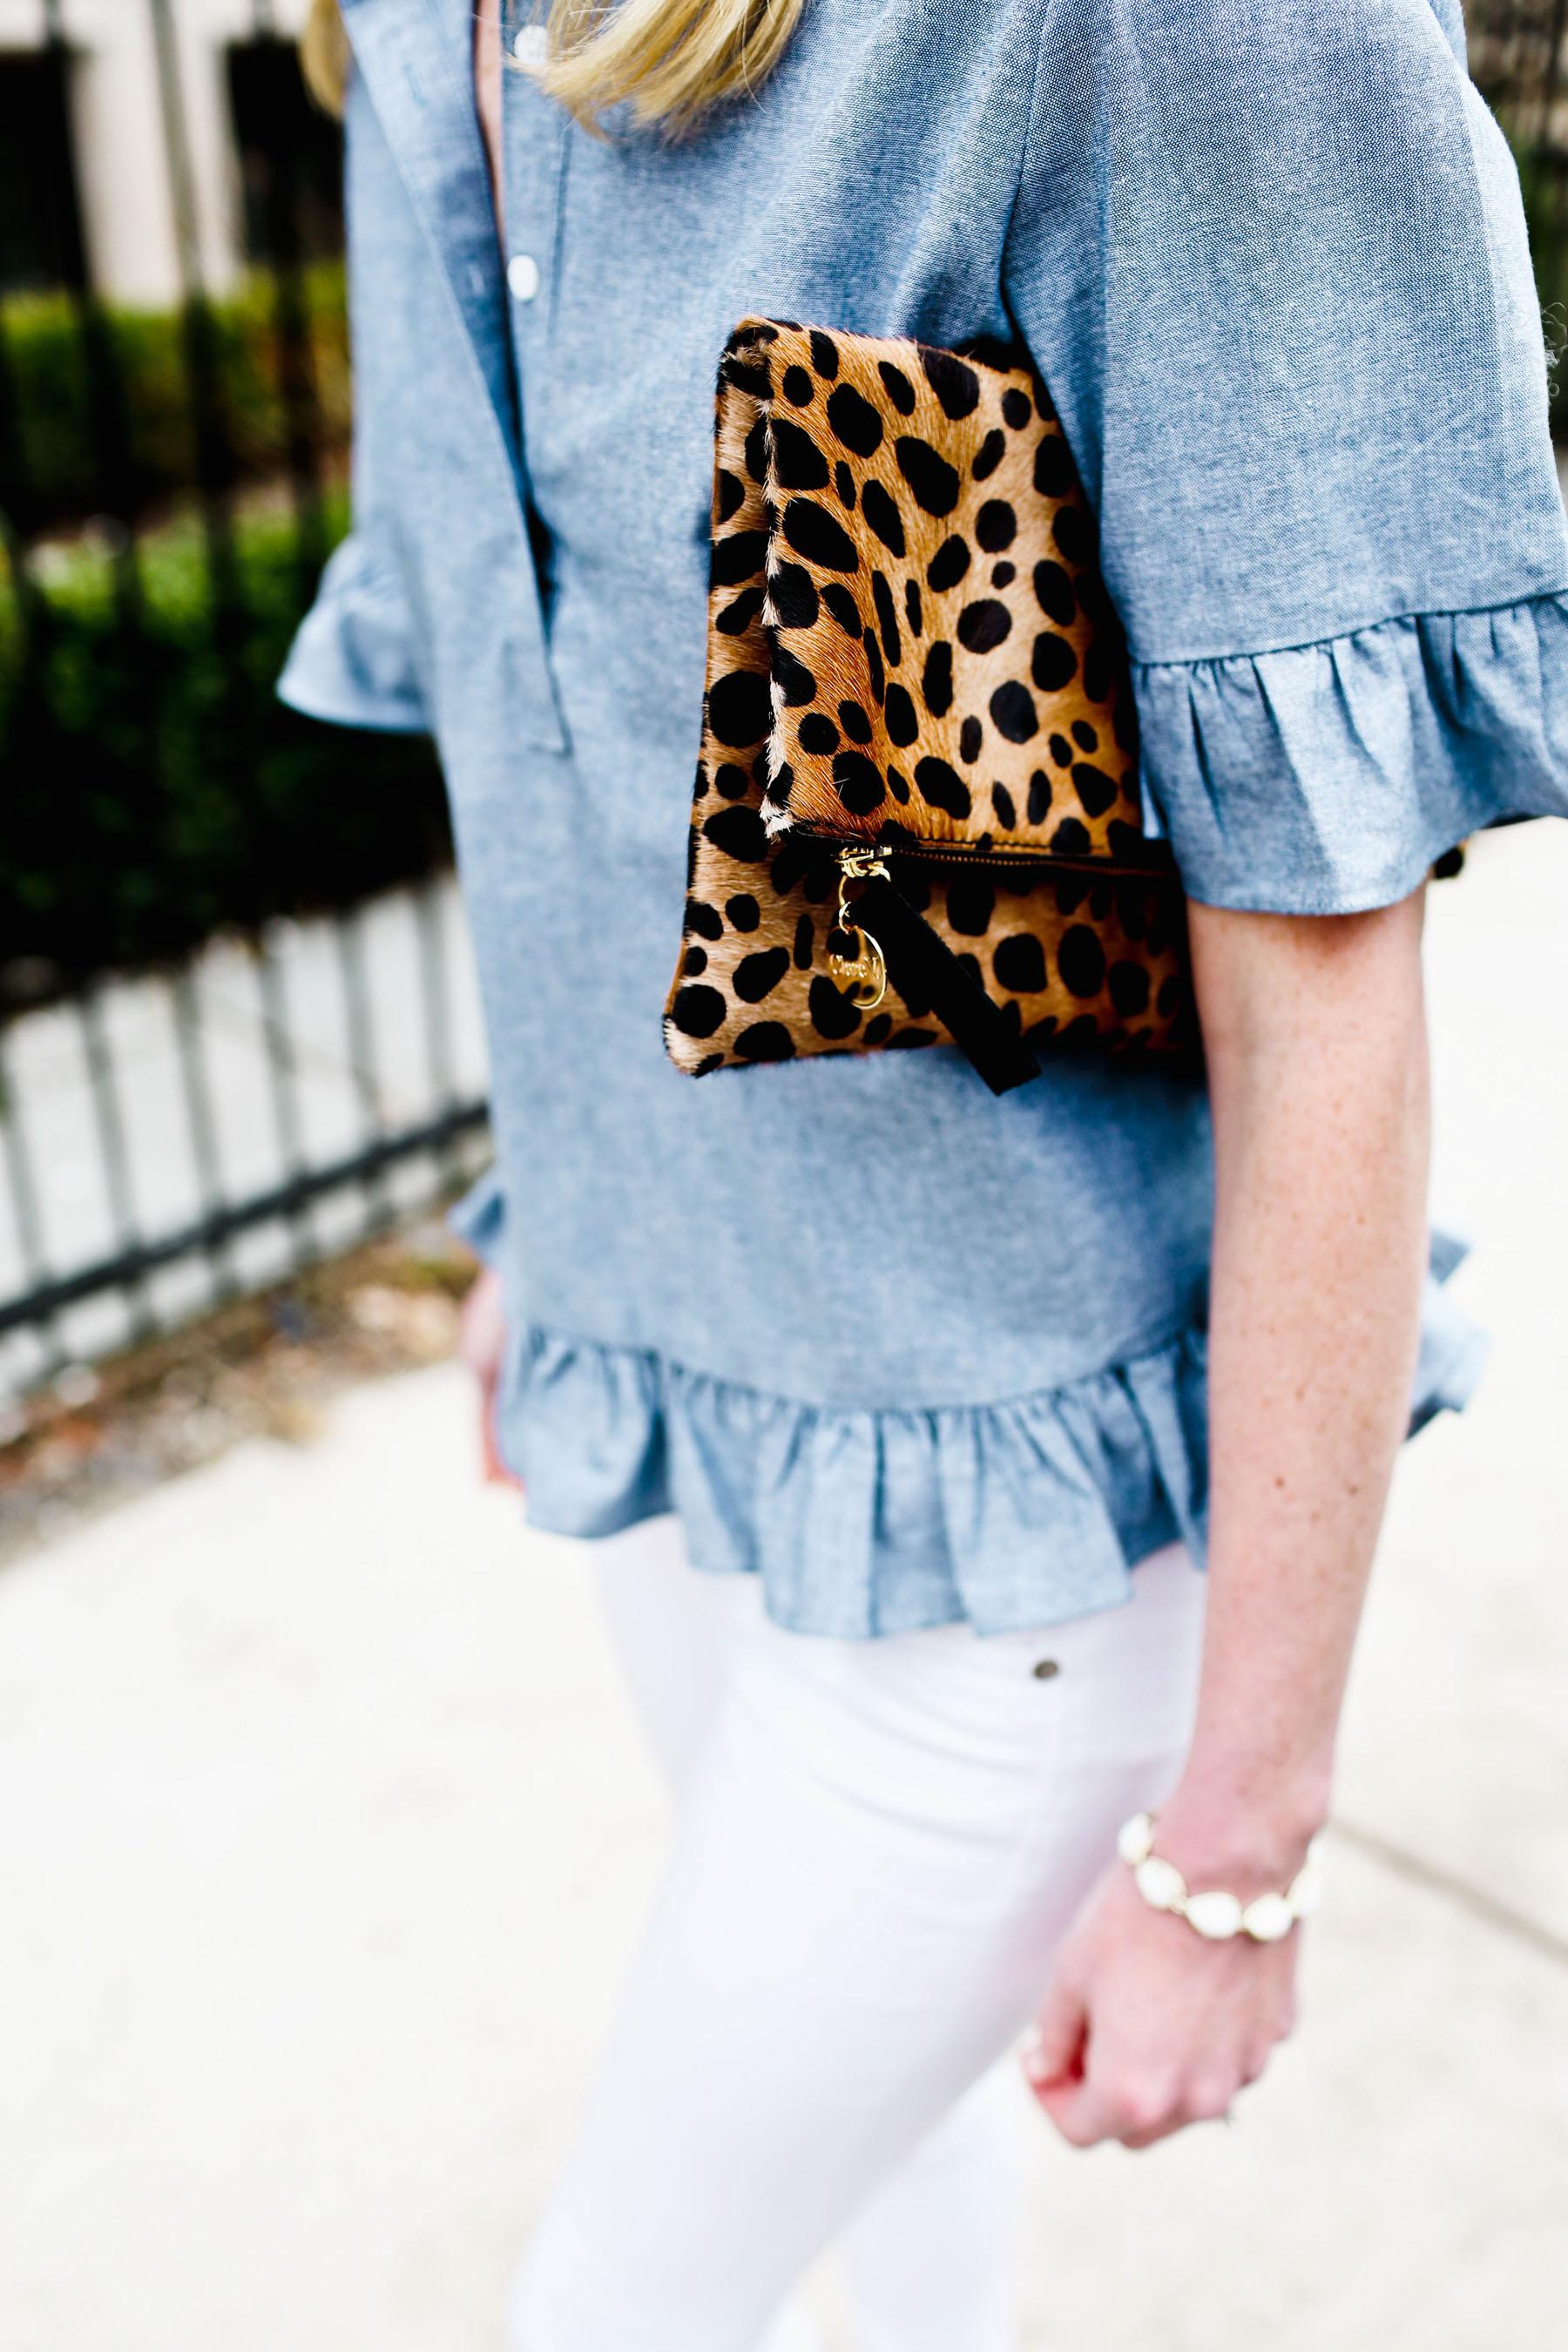 Chambray Ruffled Top / Rag & Bone Jeans / Clare V. Clutch / Kendra Scott Bracelet